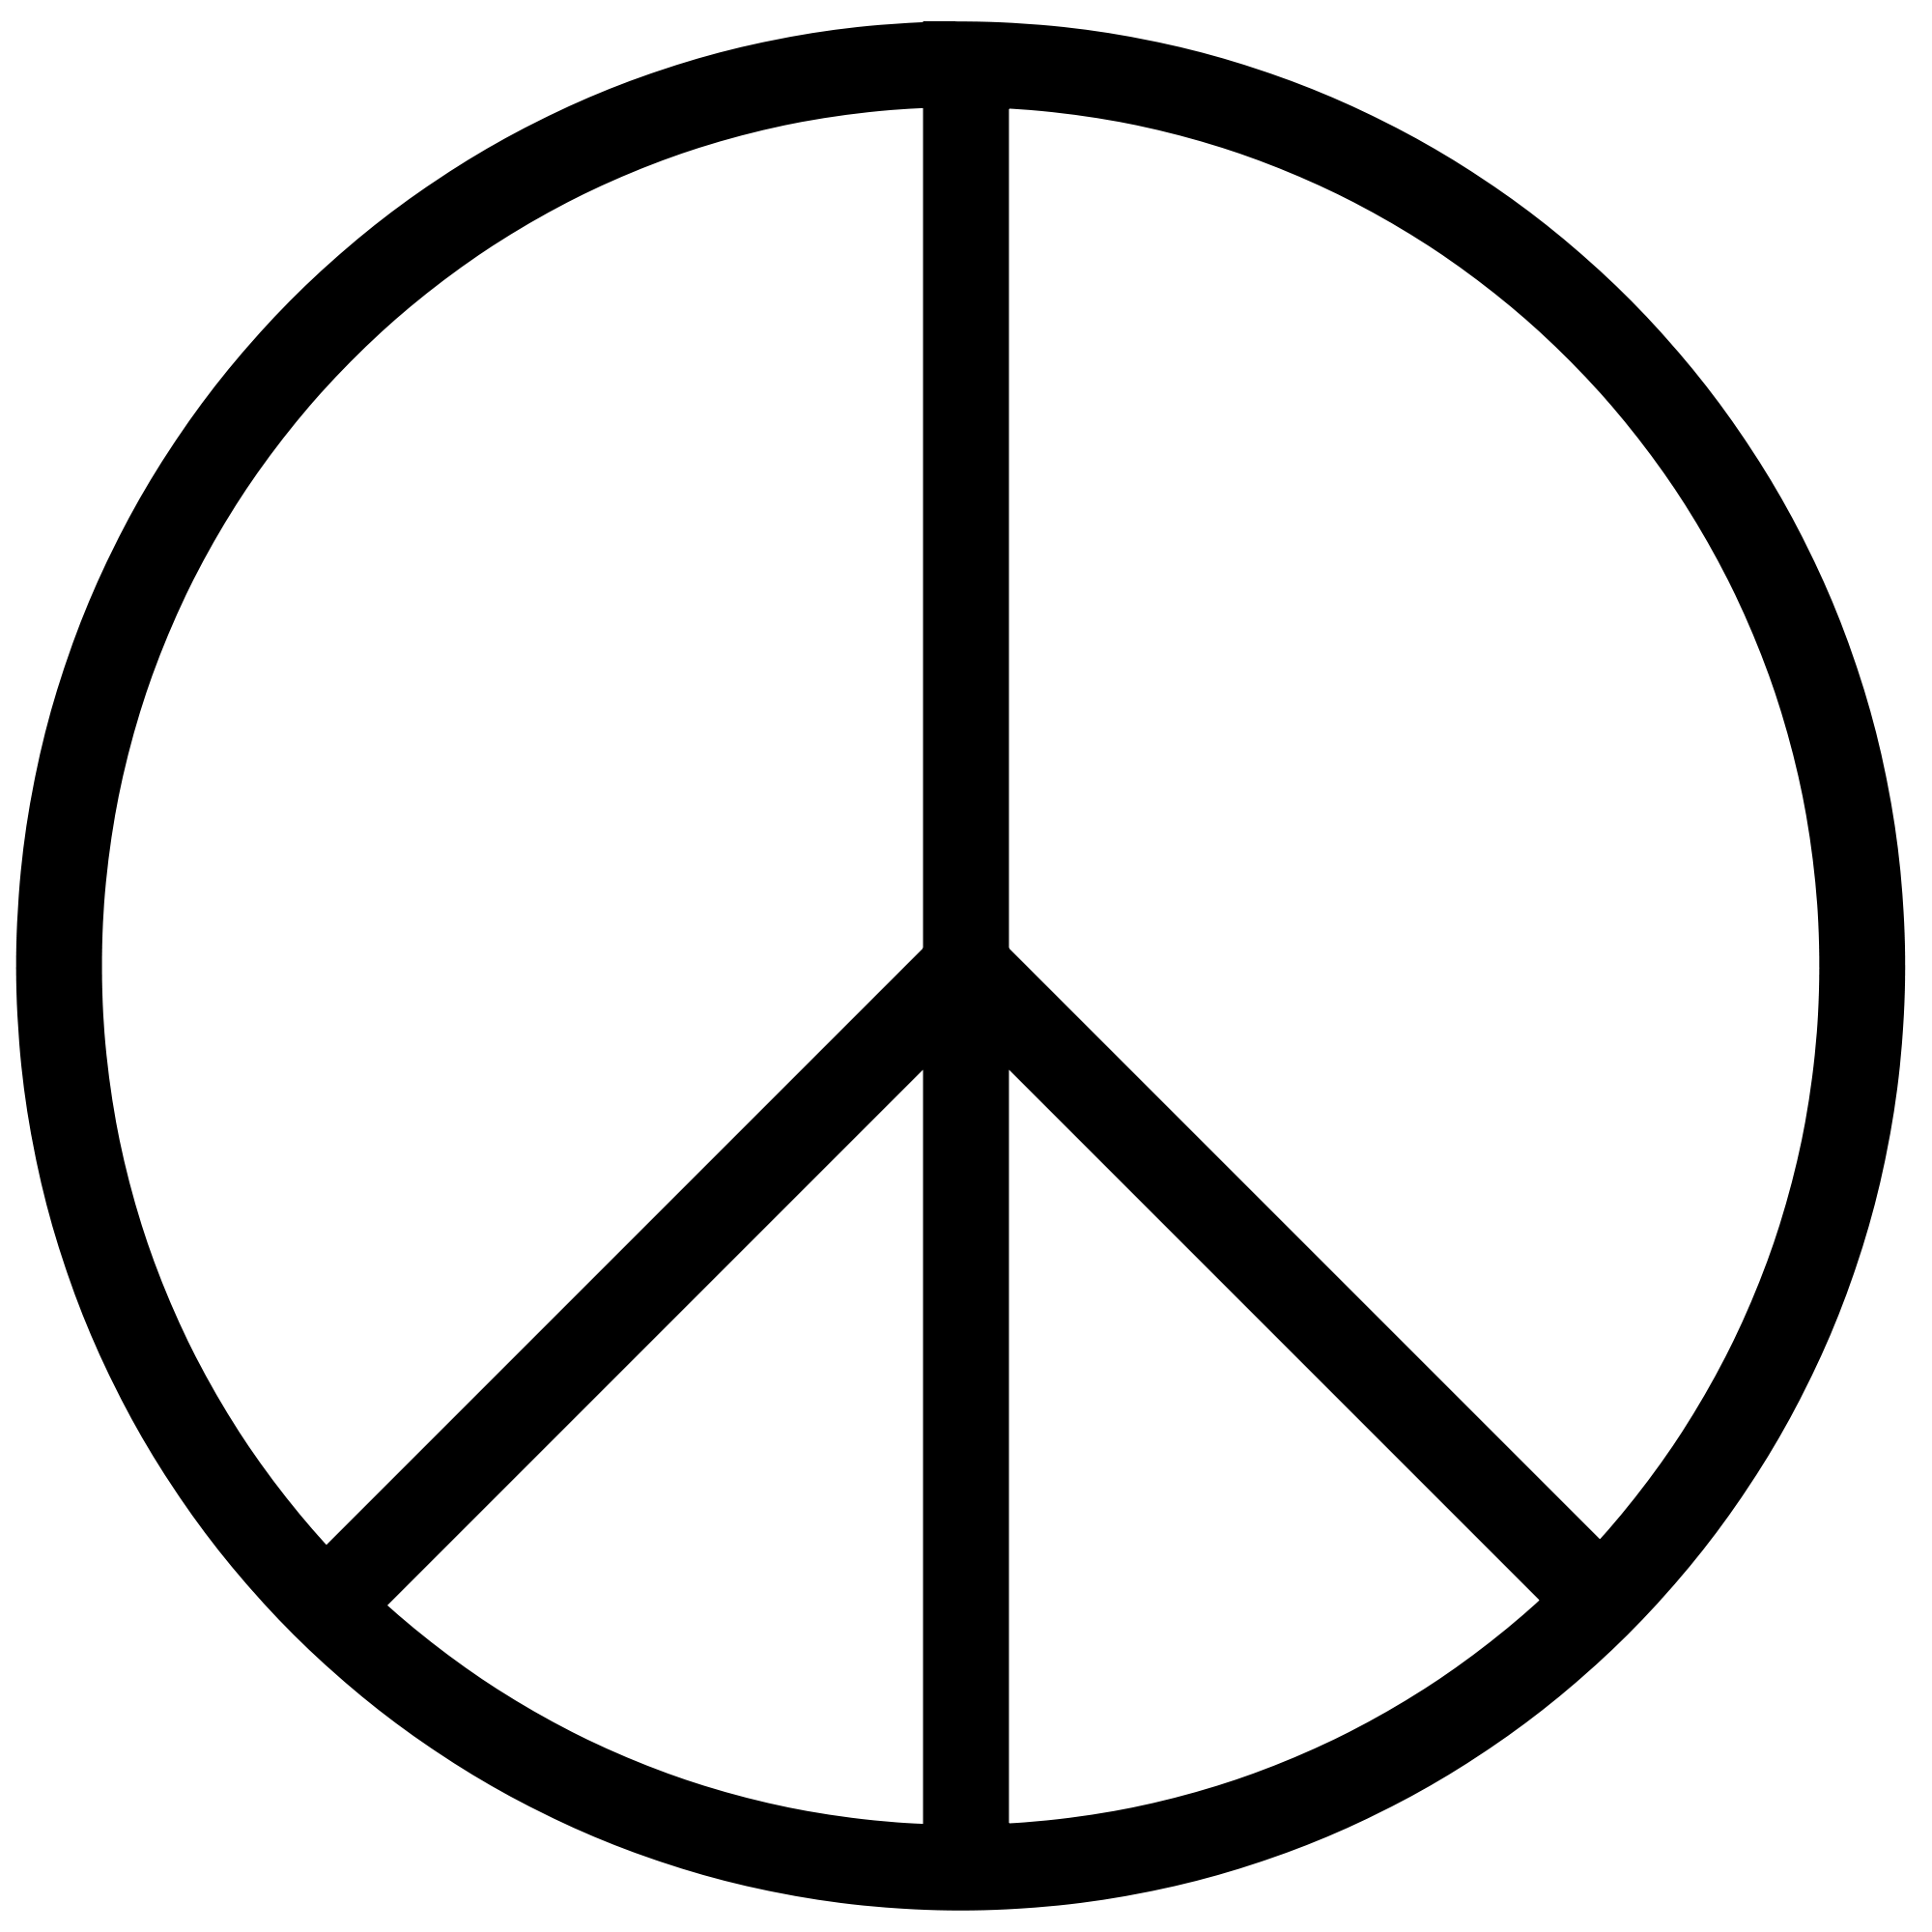 U 262E.svg - Peace Symbo PNG